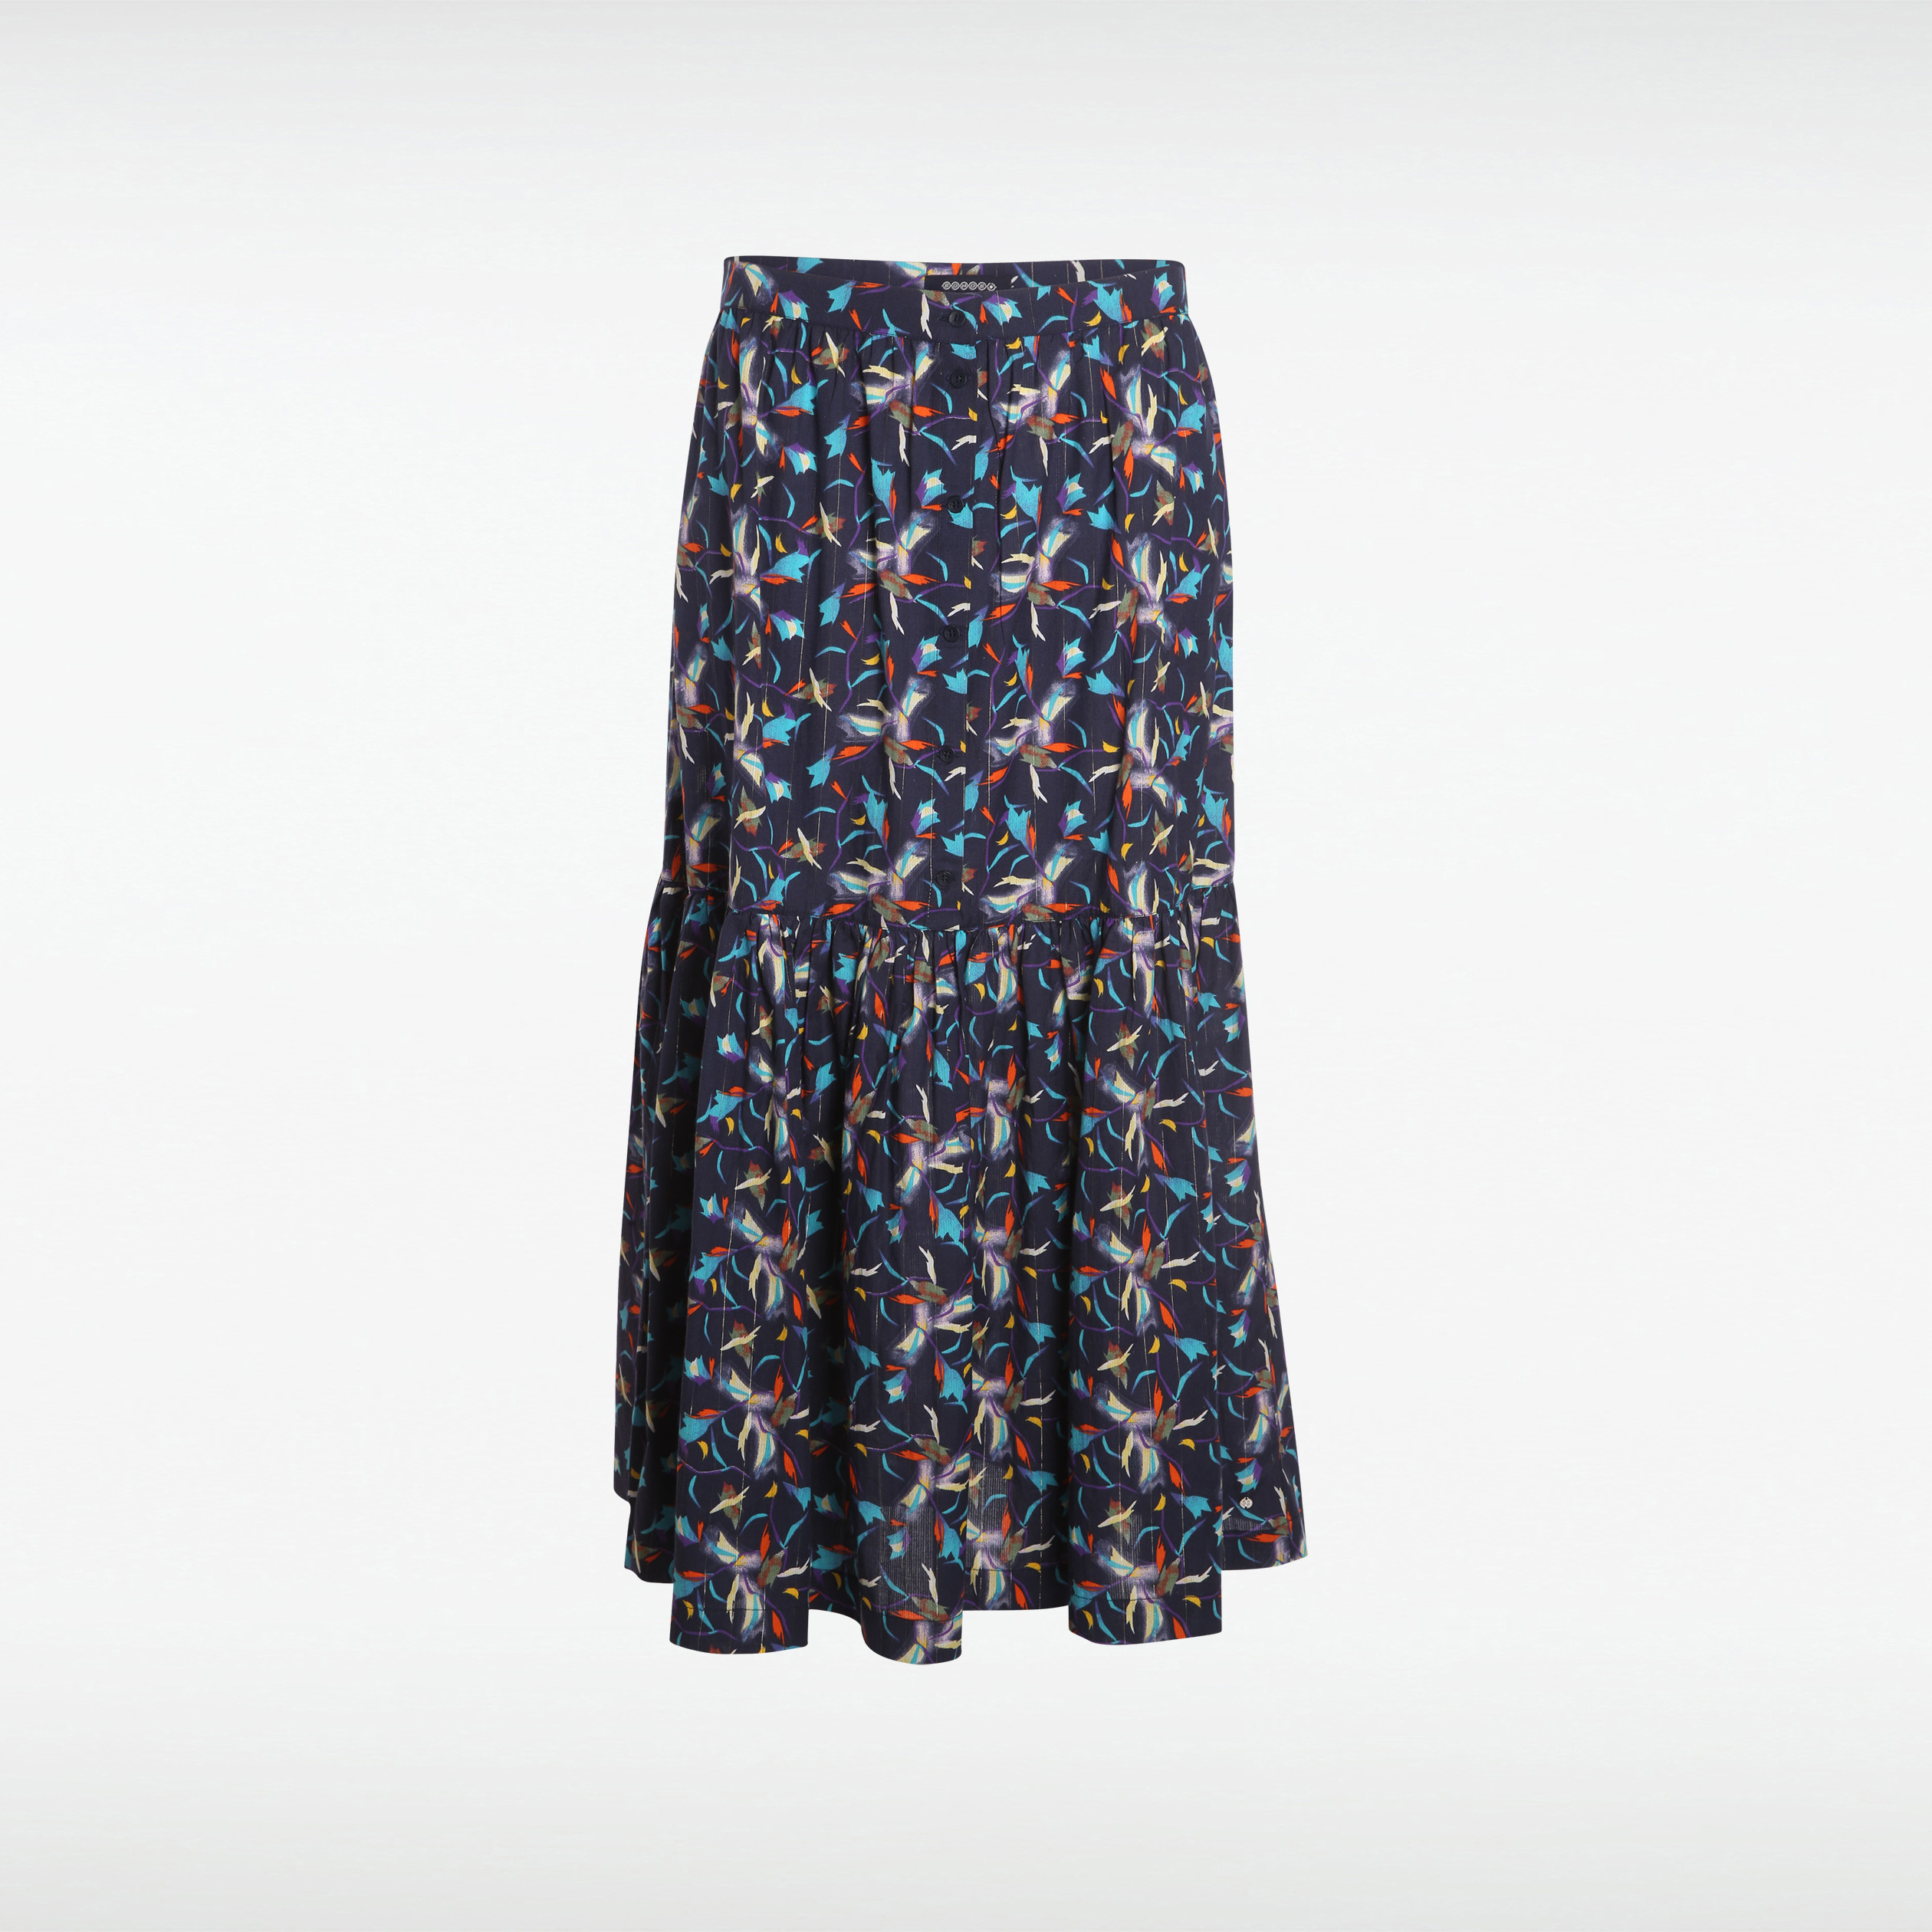 taille 40 1c4a4 a6ac3 Jupe longue bleu marine femme